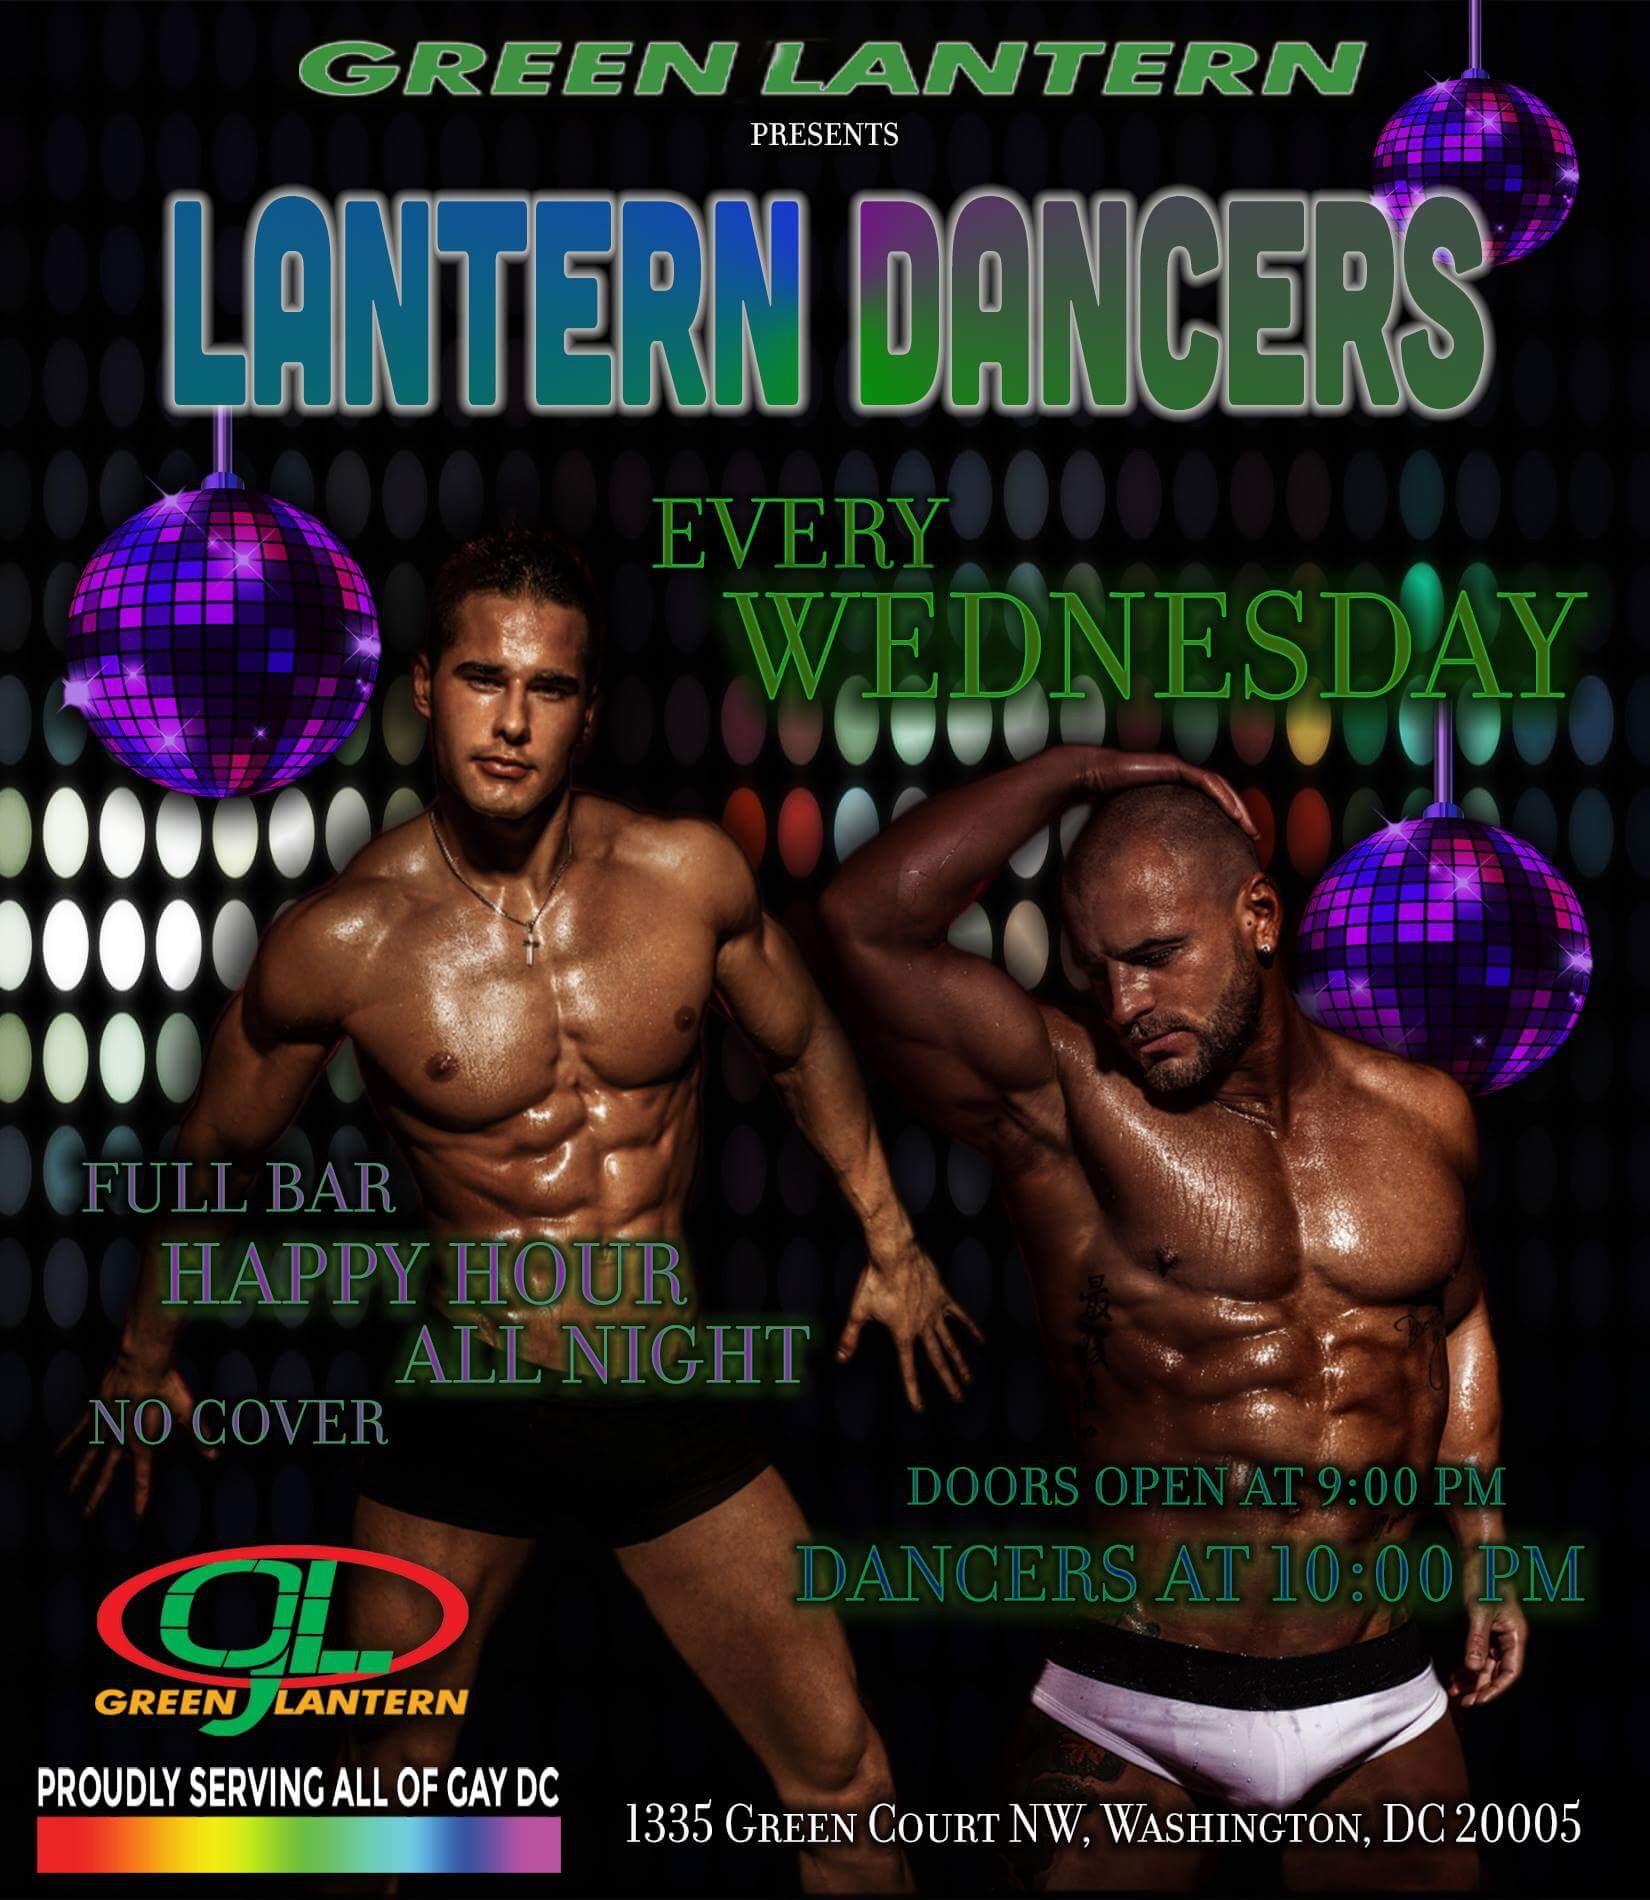 Lantern Dancers